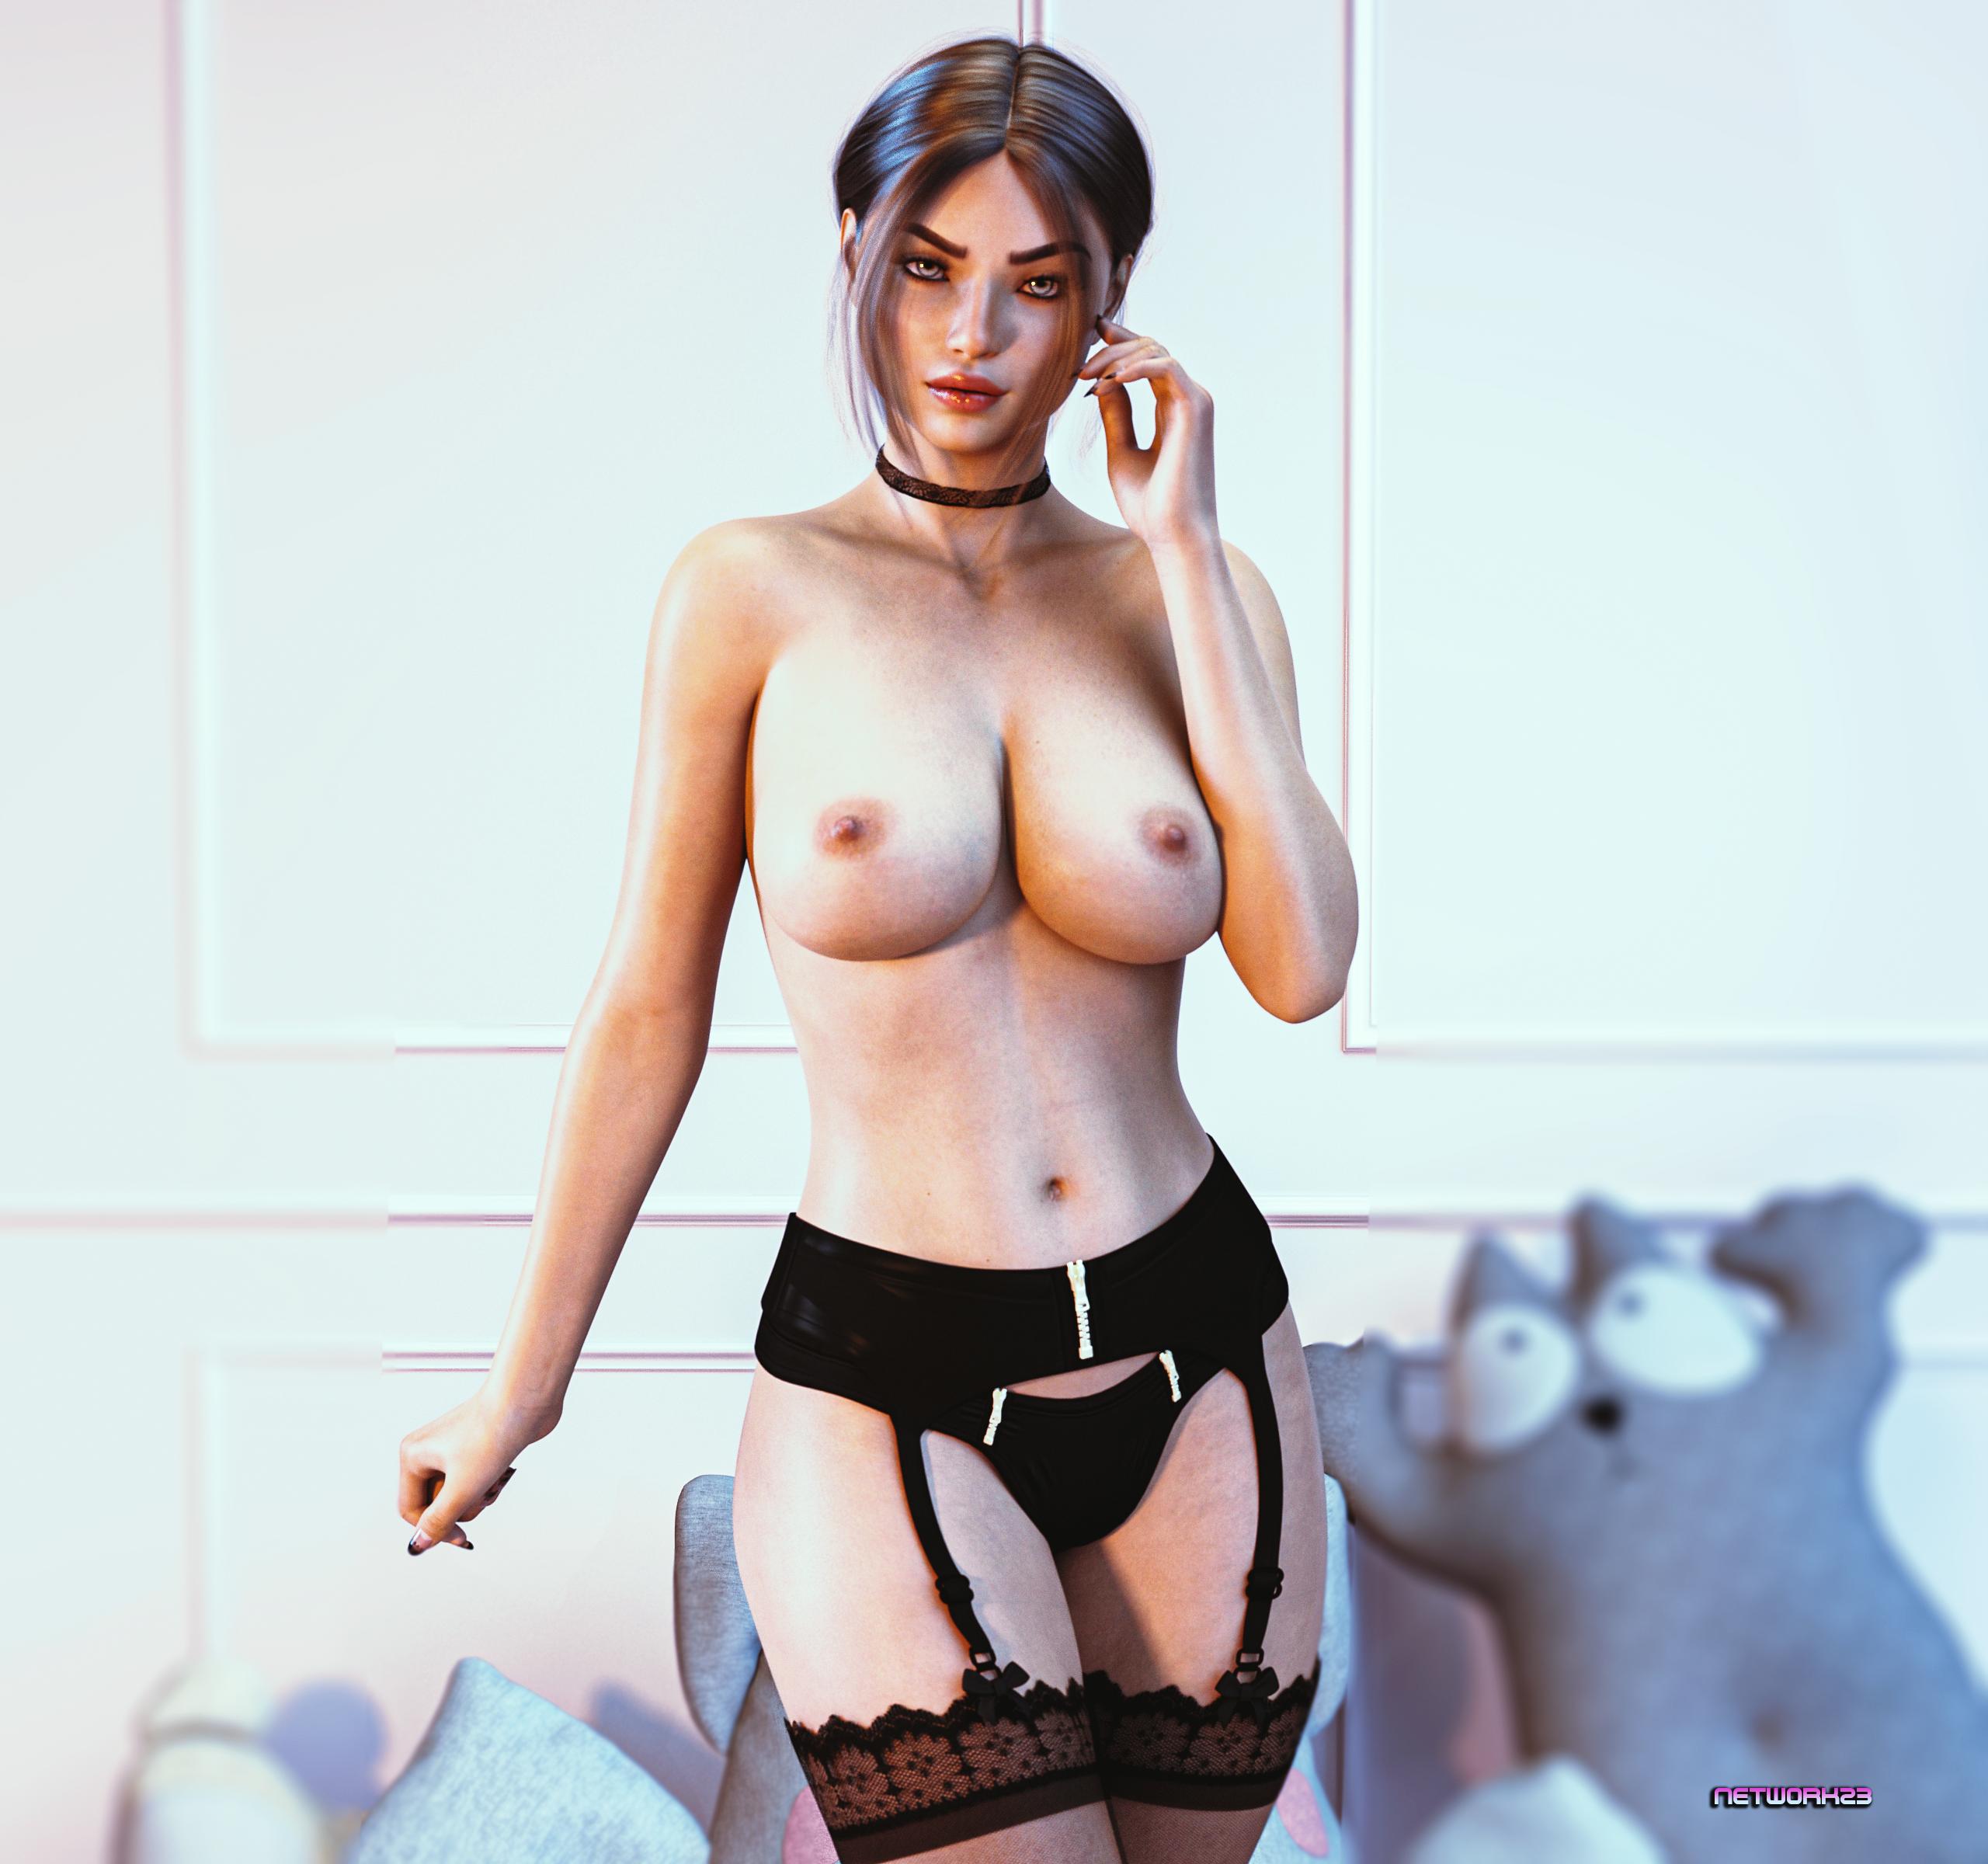 https://i2.imageban.ru/out/2021/06/23/b41746cc70d96644ceb6280f6056d71b.png